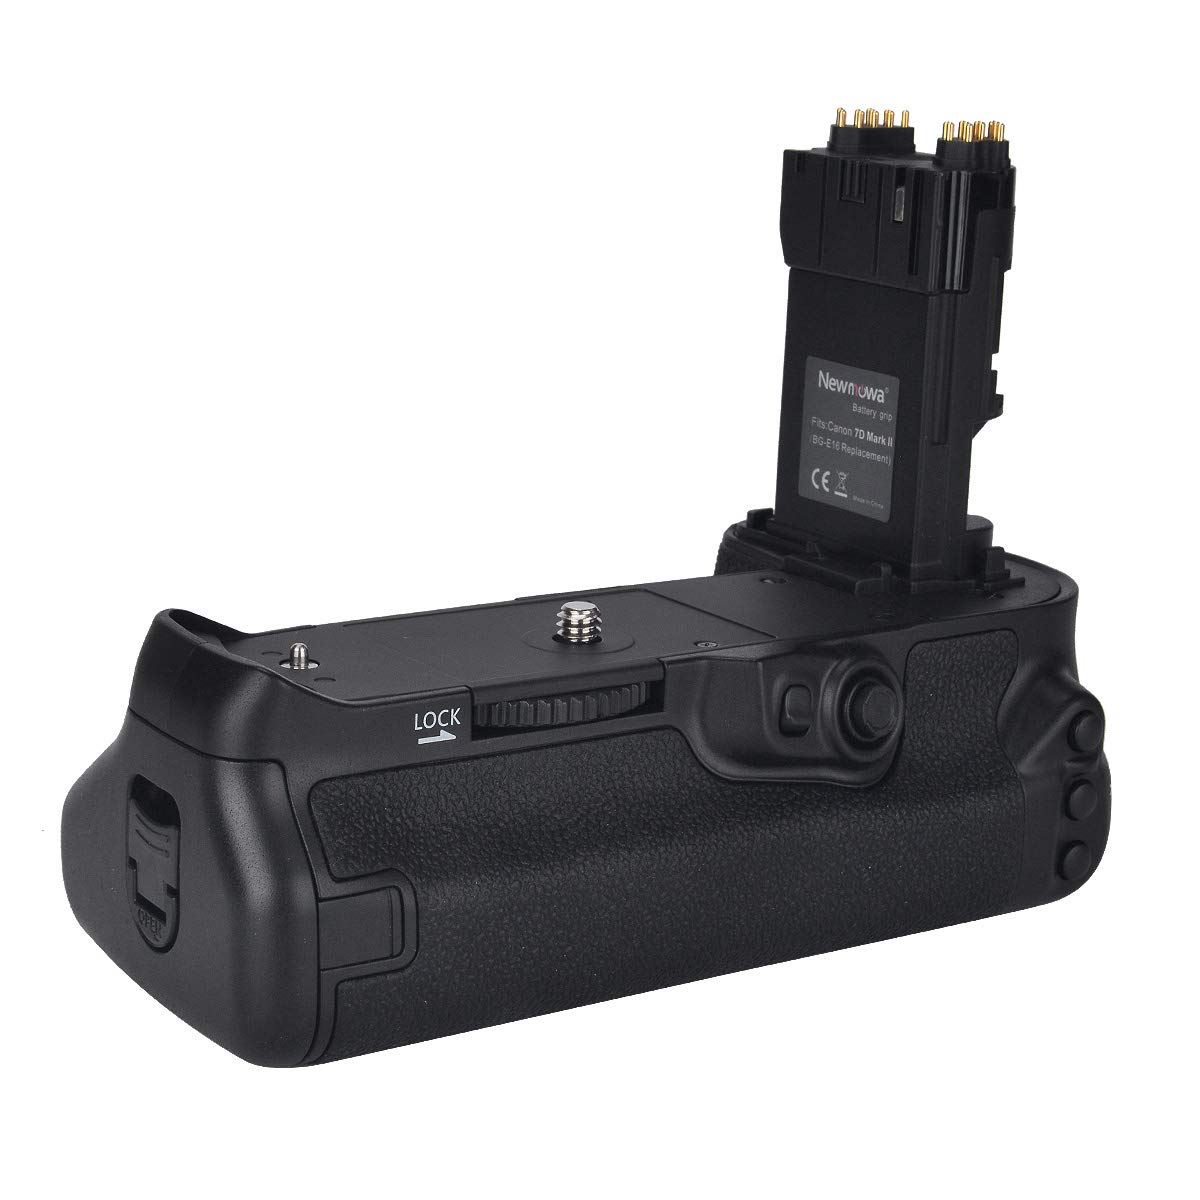 Accessories Electronics & Photo Newmowa BG-E14 Vertical Battery ...